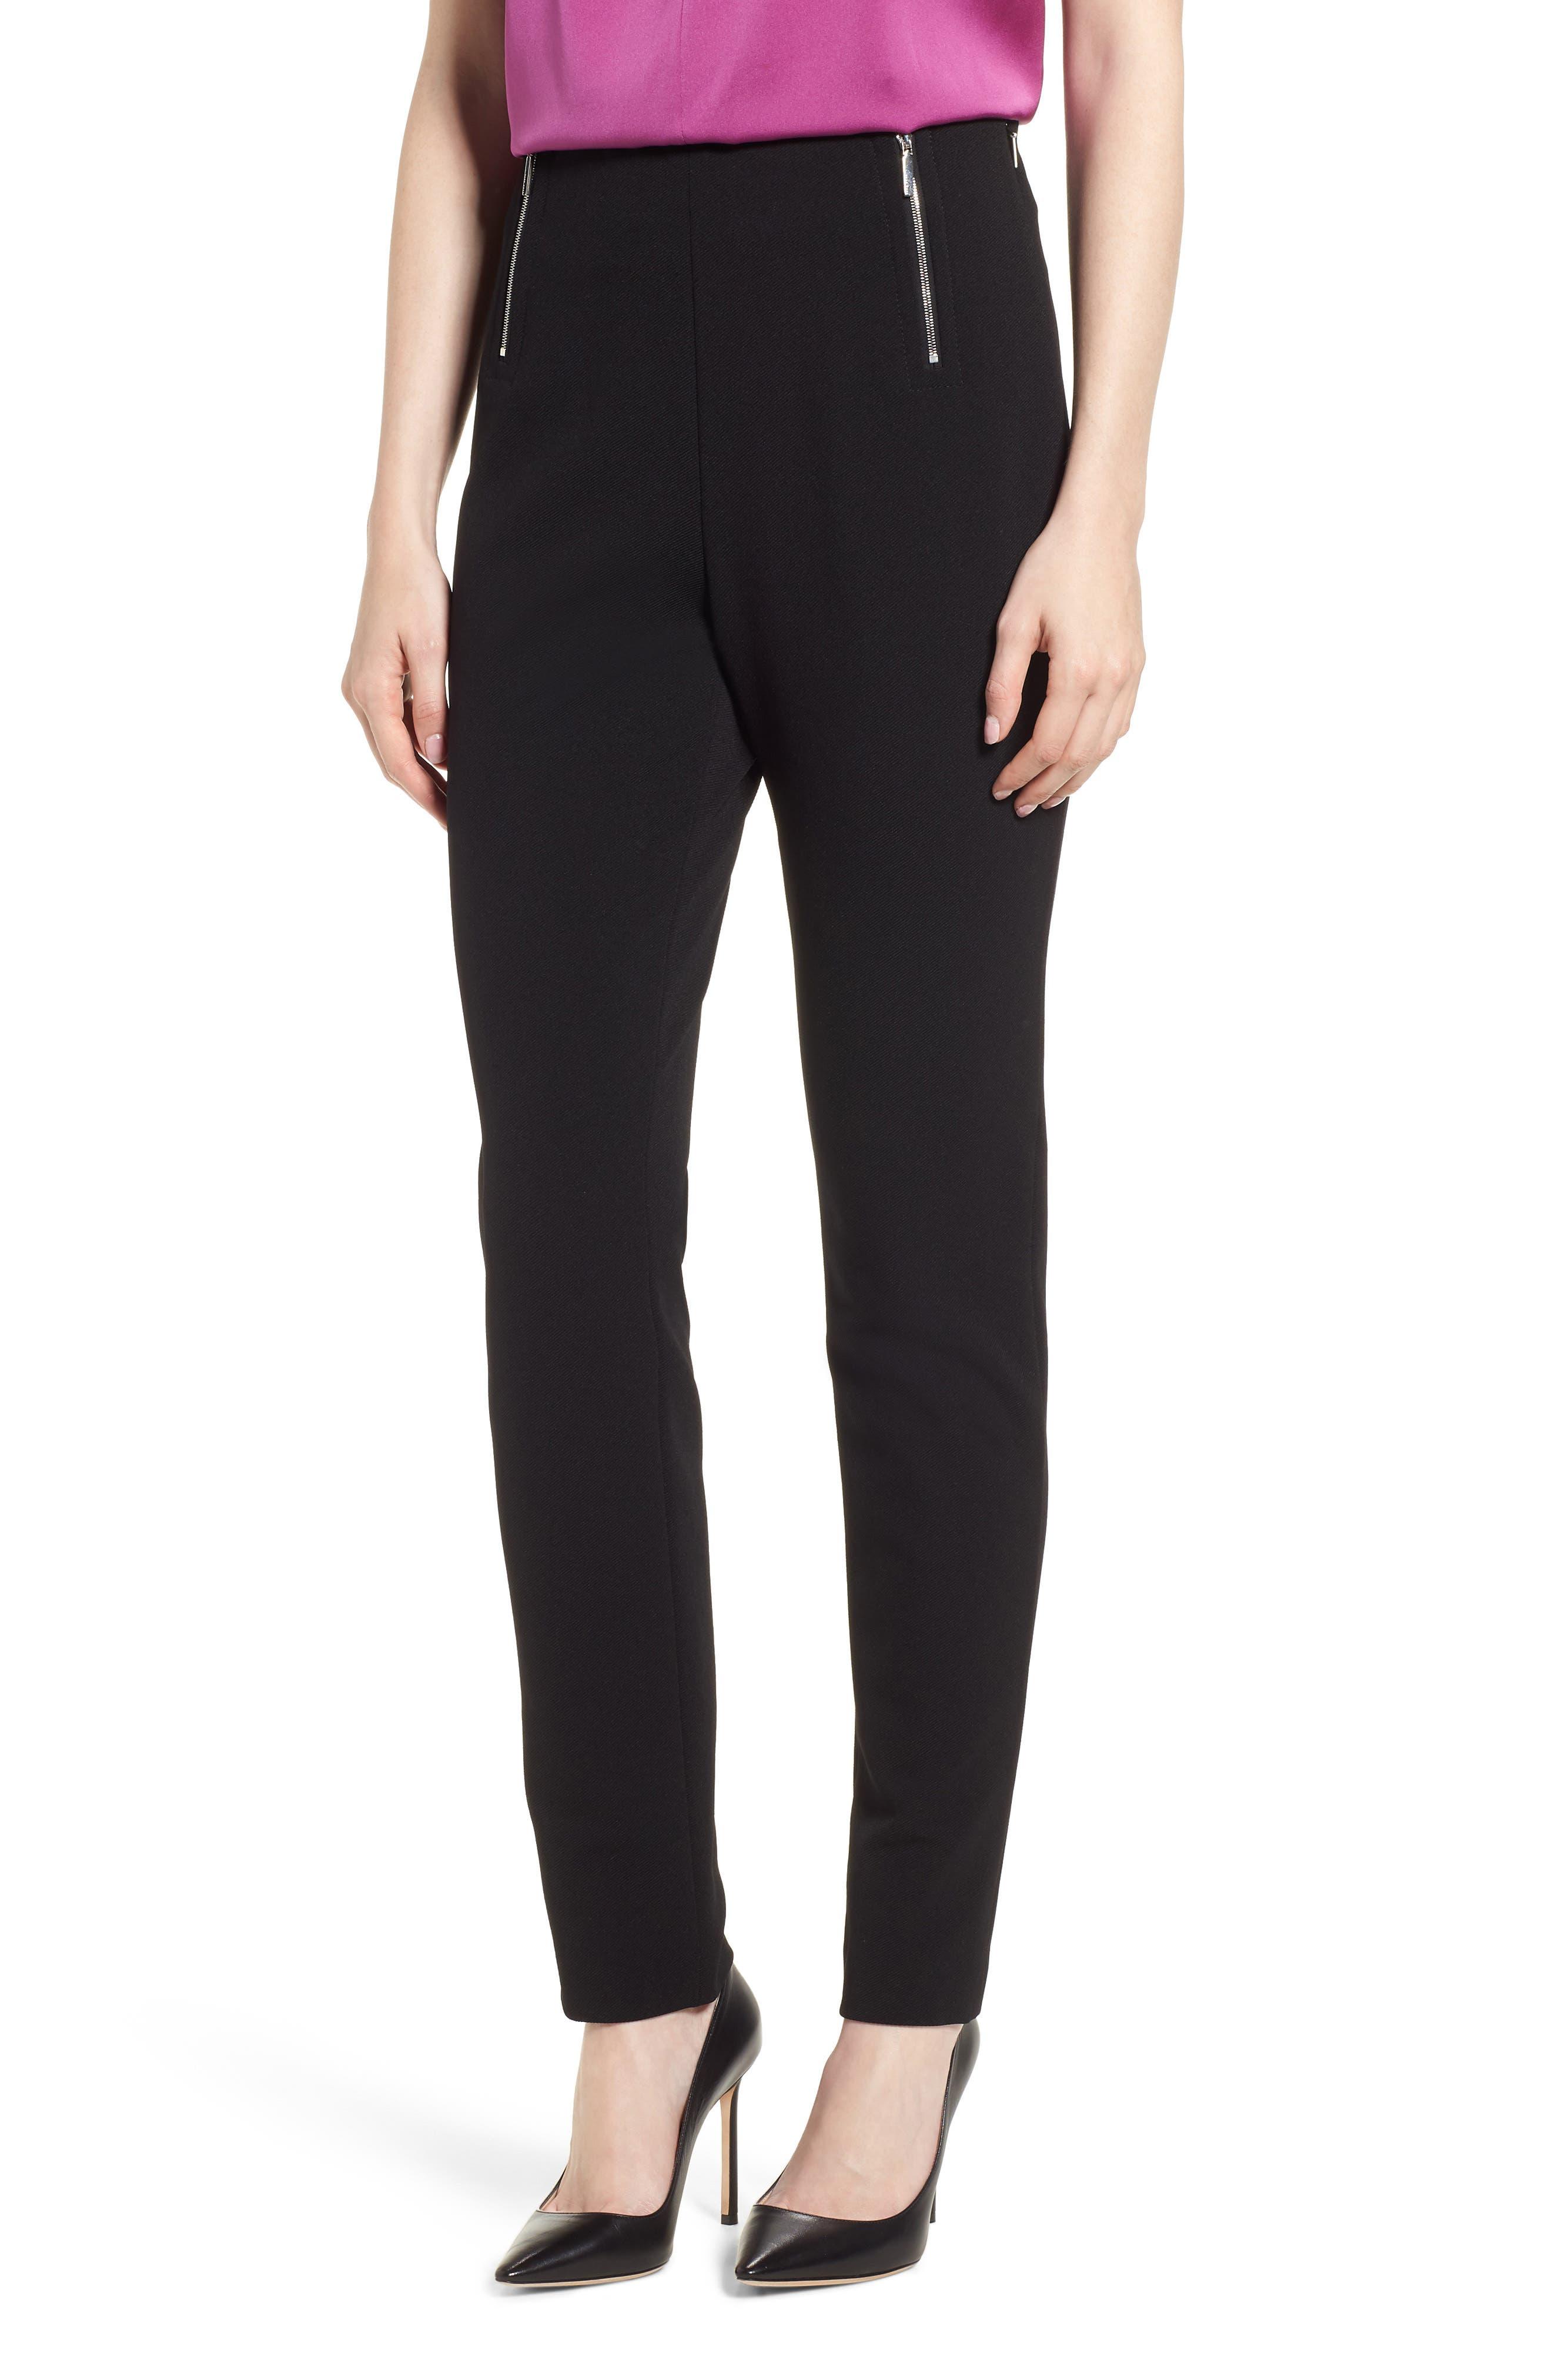 Tilezea Twill Jersey Trousers,                             Main thumbnail 1, color,                             Black